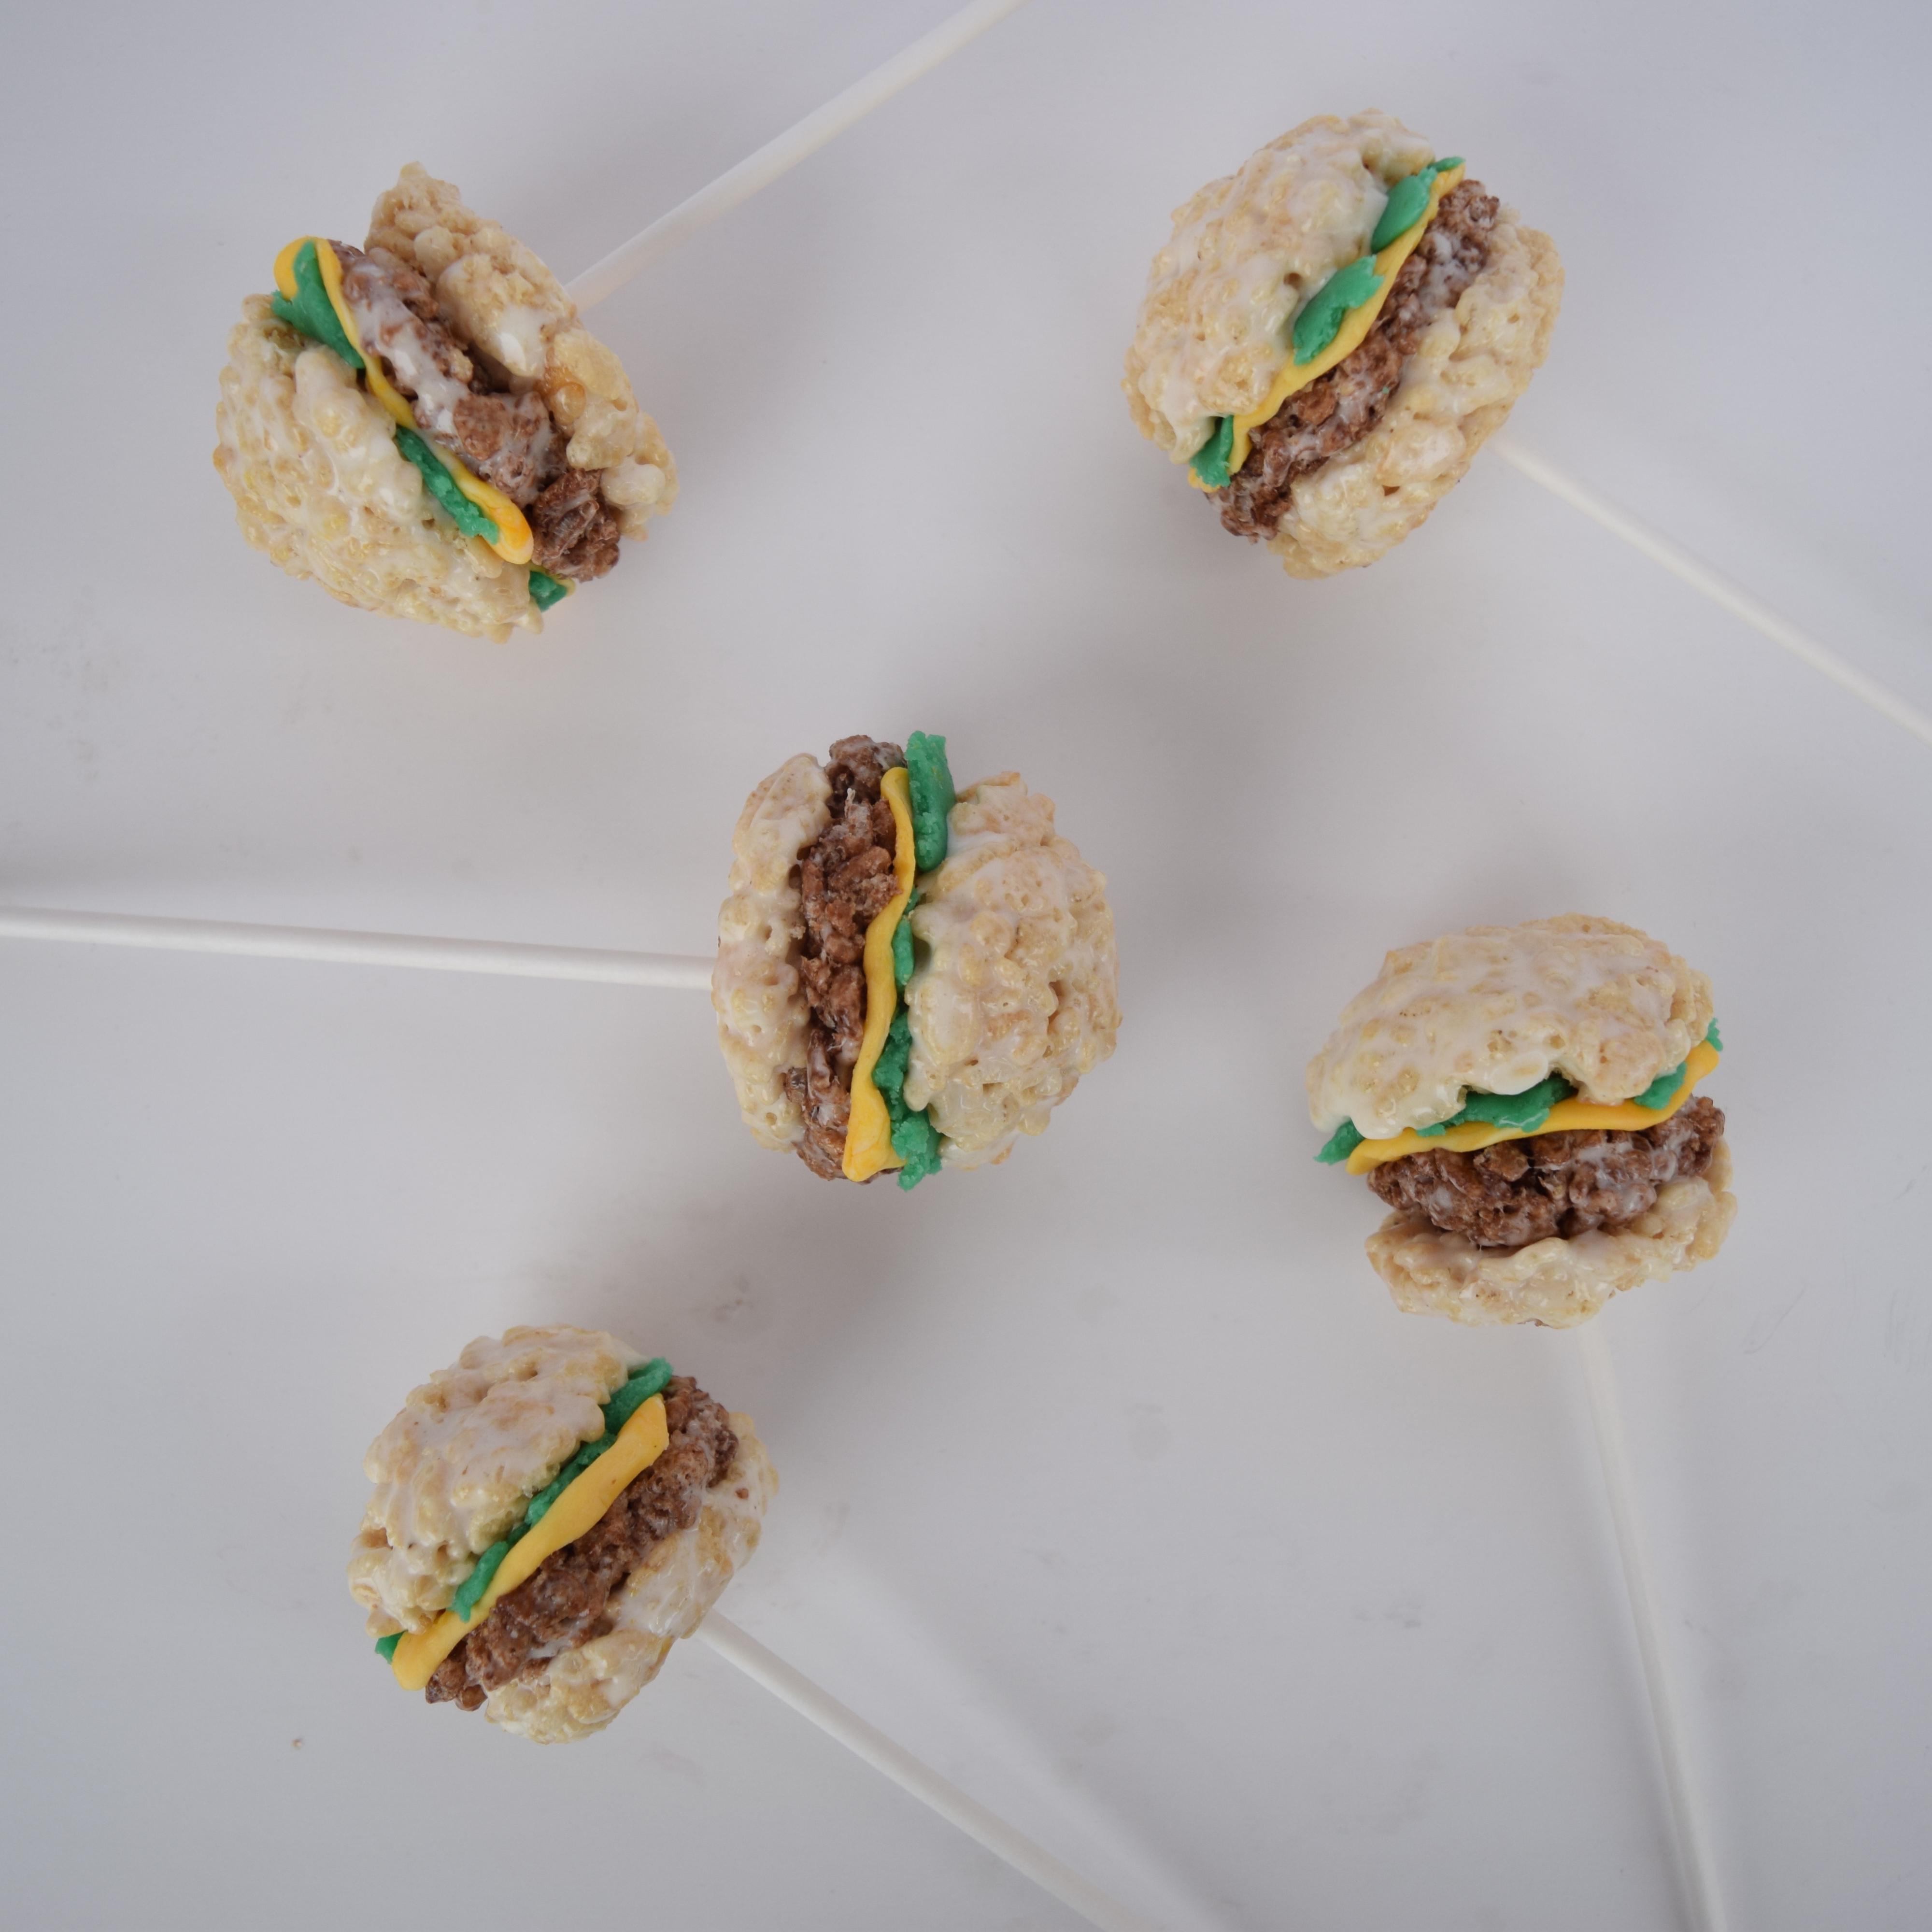 Burger Krispops Public Lives Secret Recipes Burger Krispops.jpg